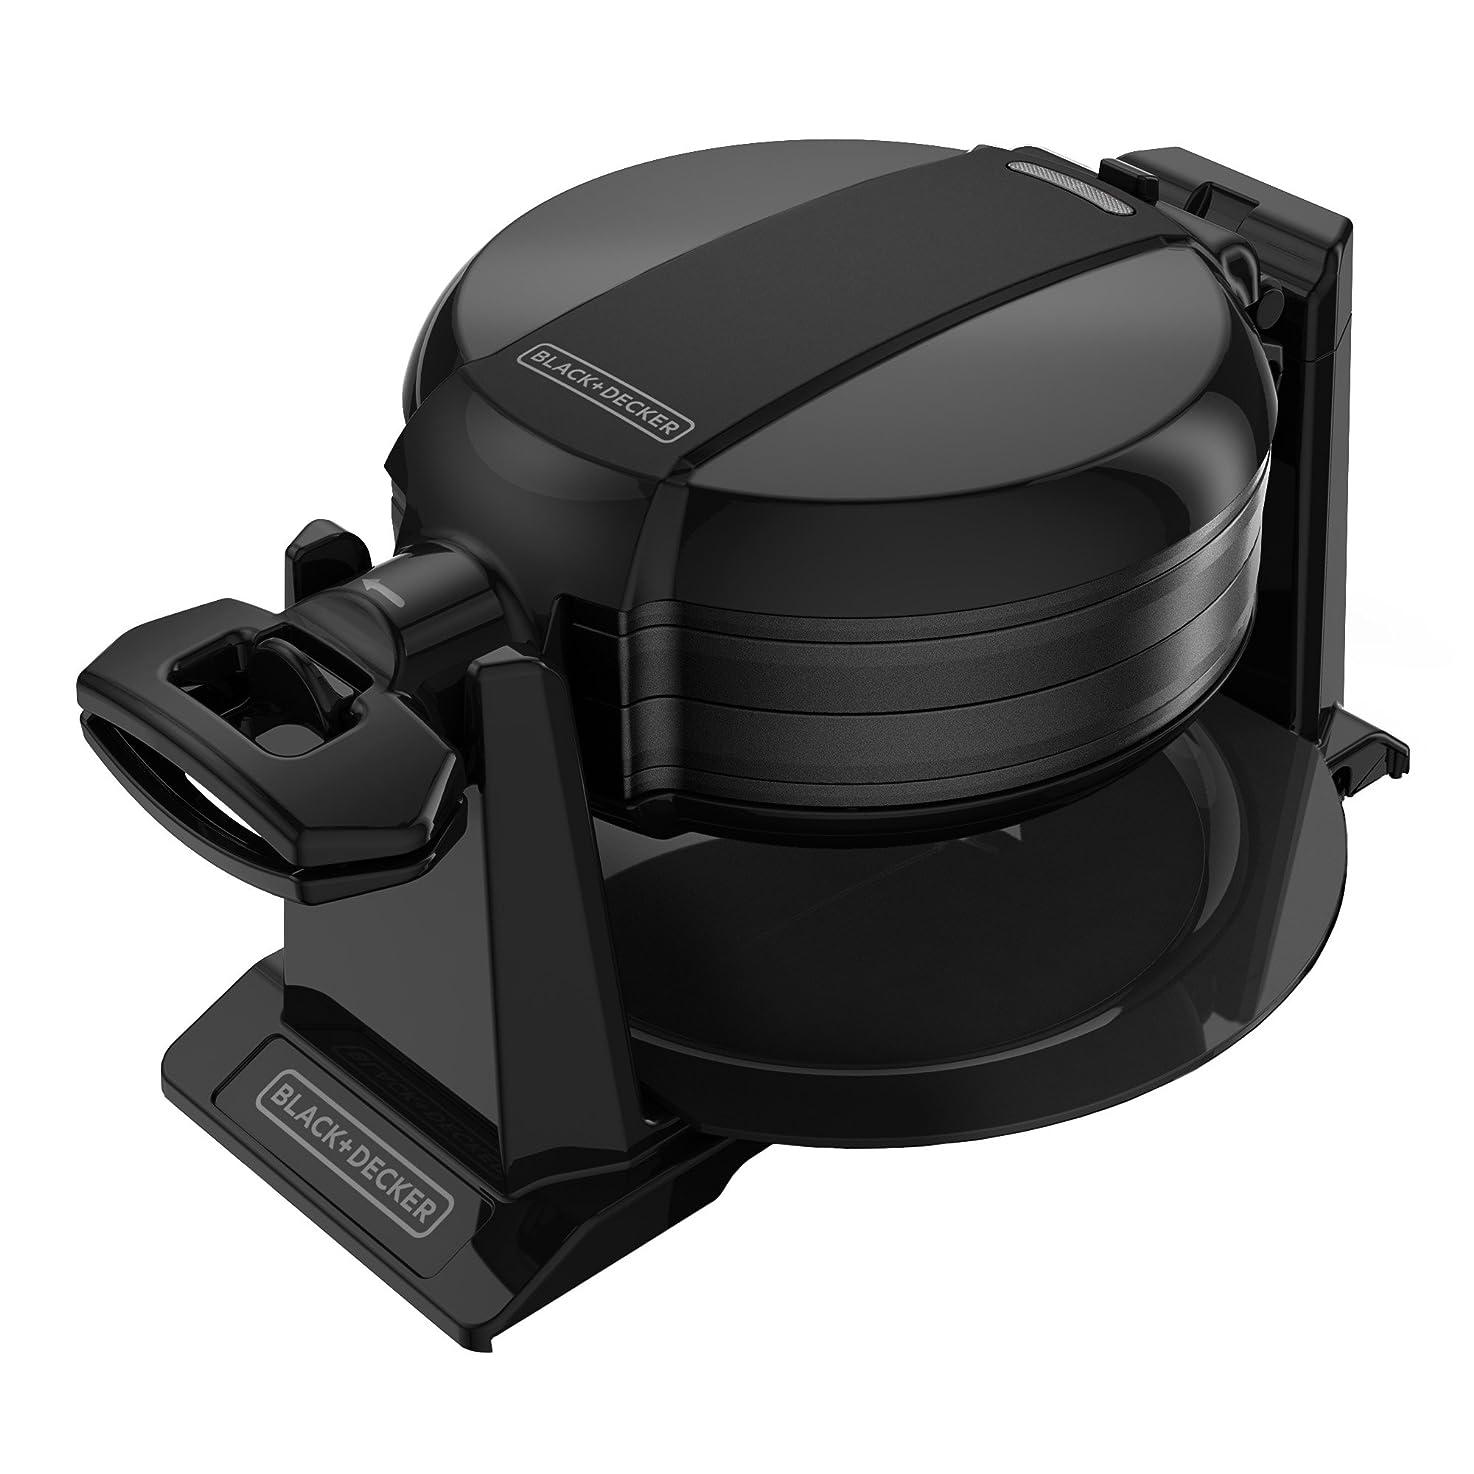 BLACK+DECKER Rotating Waffle Maker, Black, WMD200B bvdwdnpifebpz8